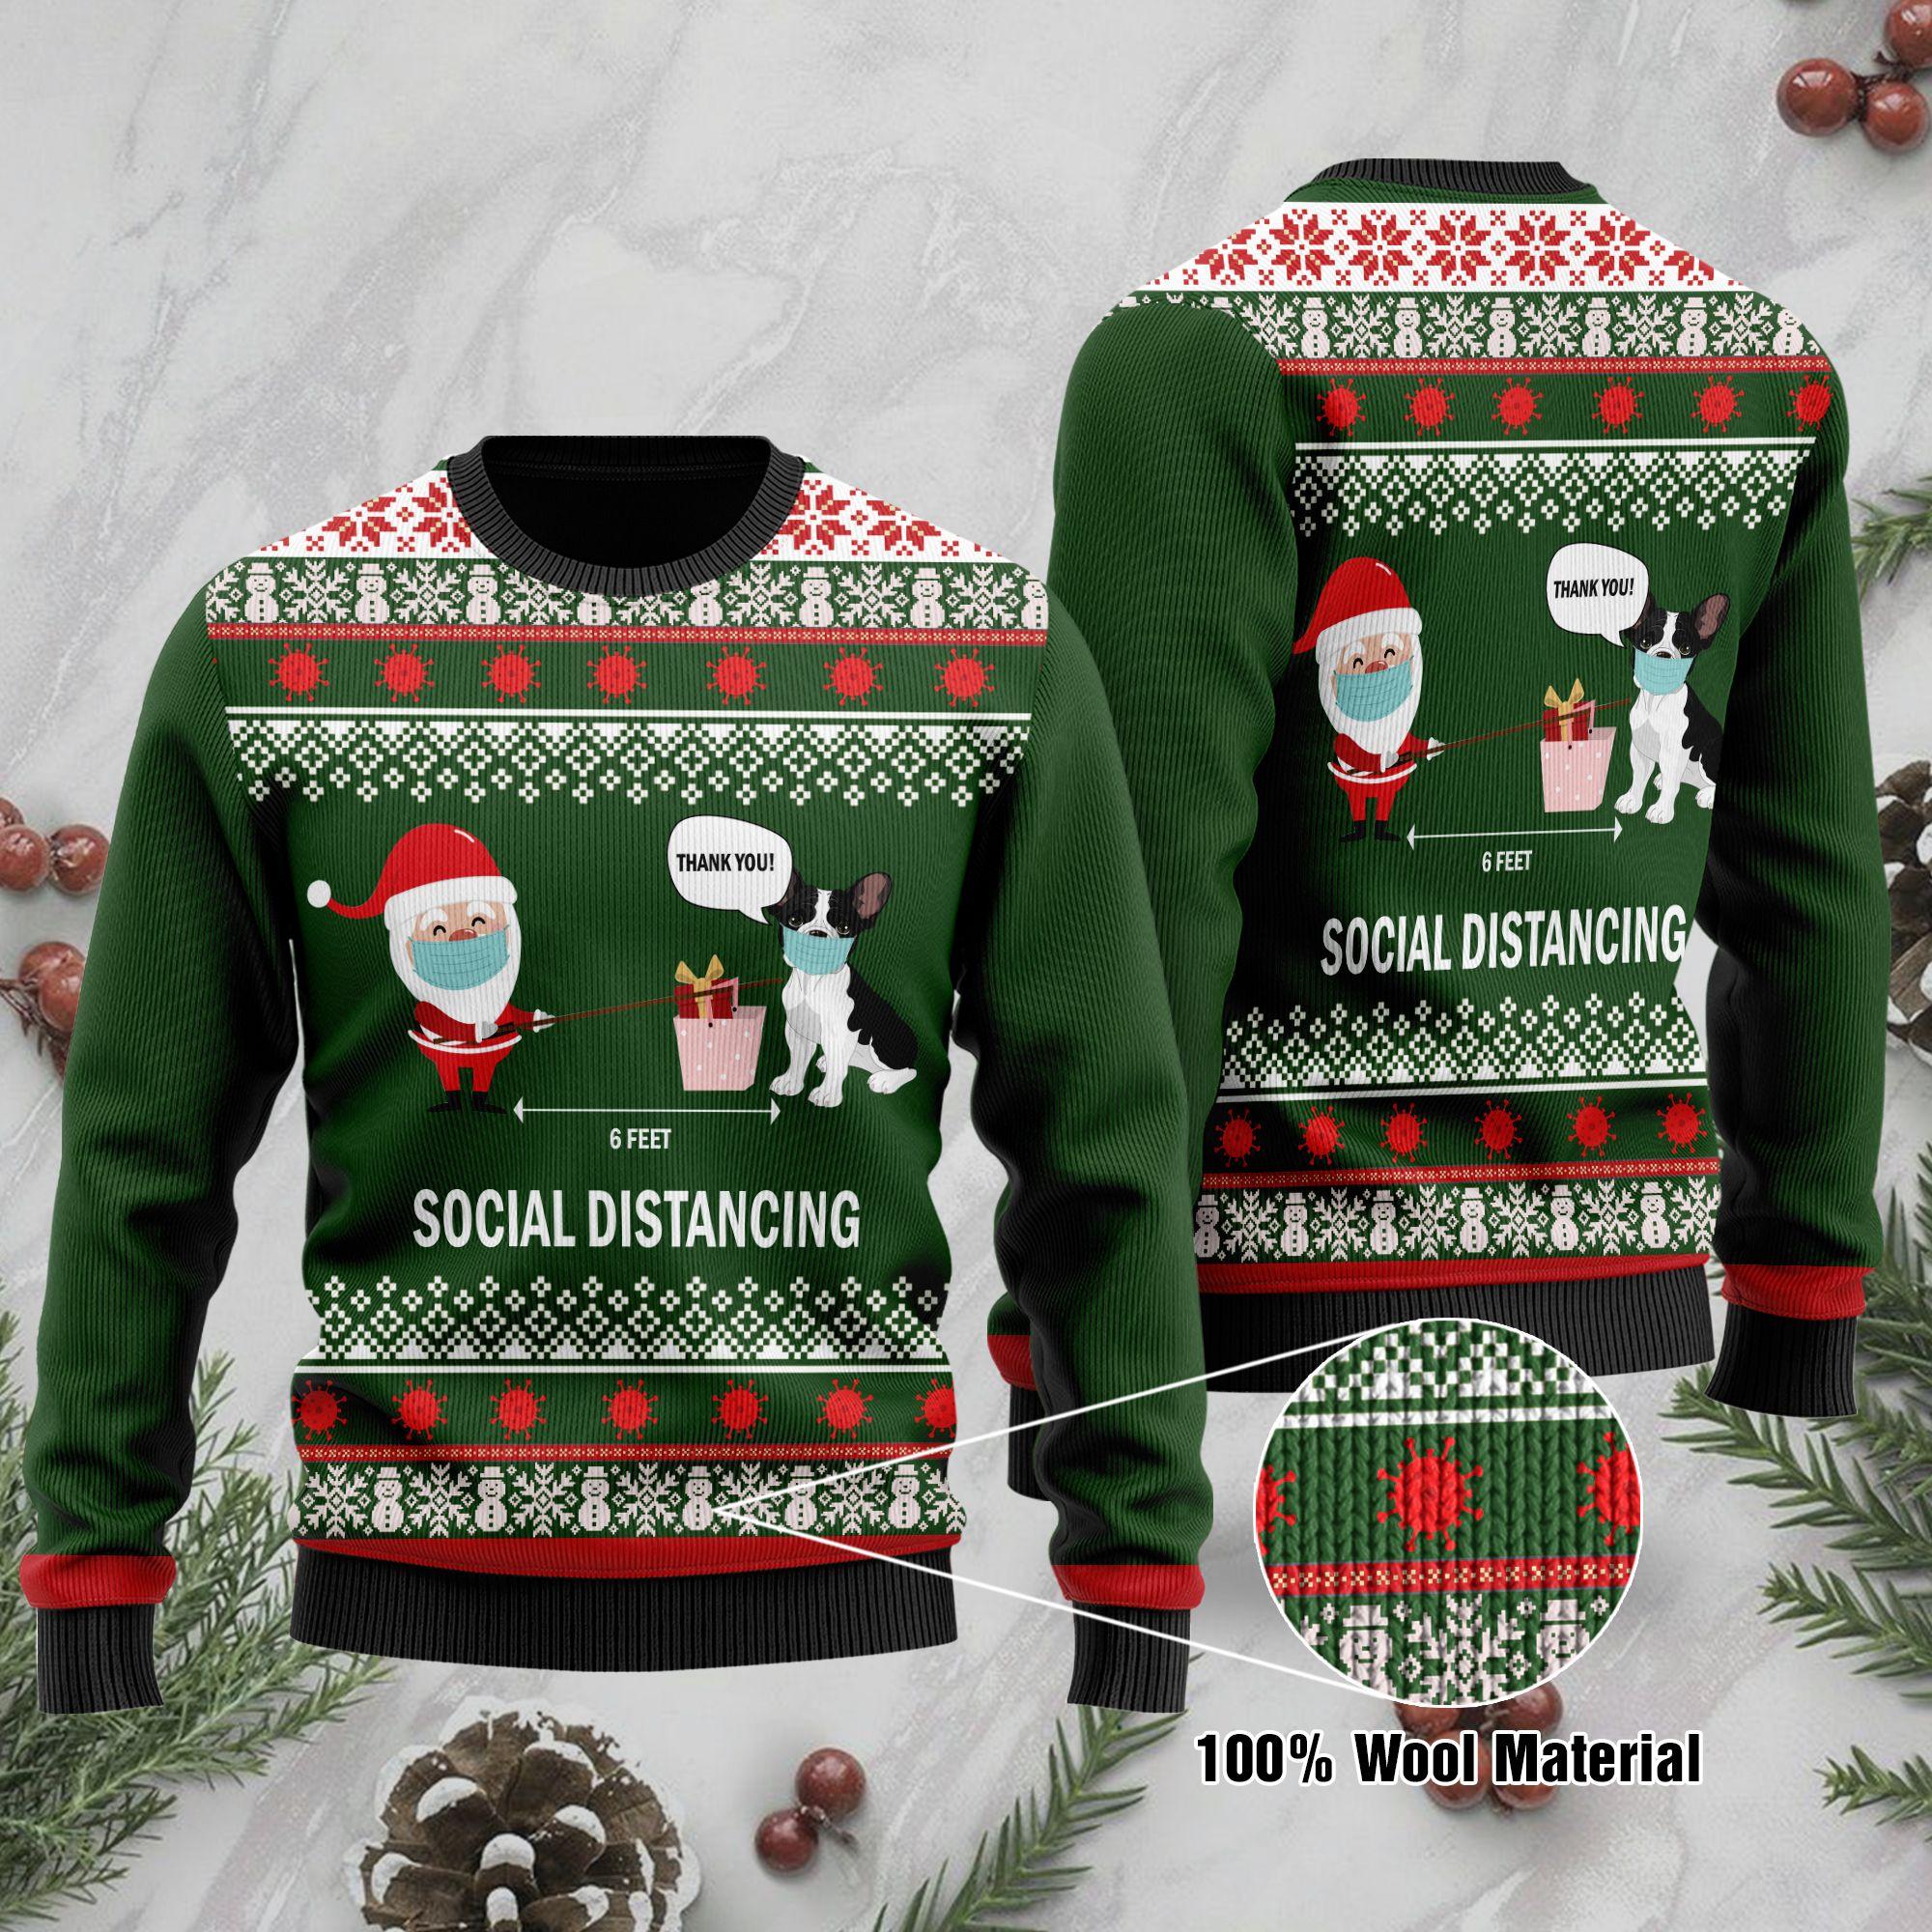 6 Feet Social Distancing French Bulldog And Santa Claus Ugly Sweater